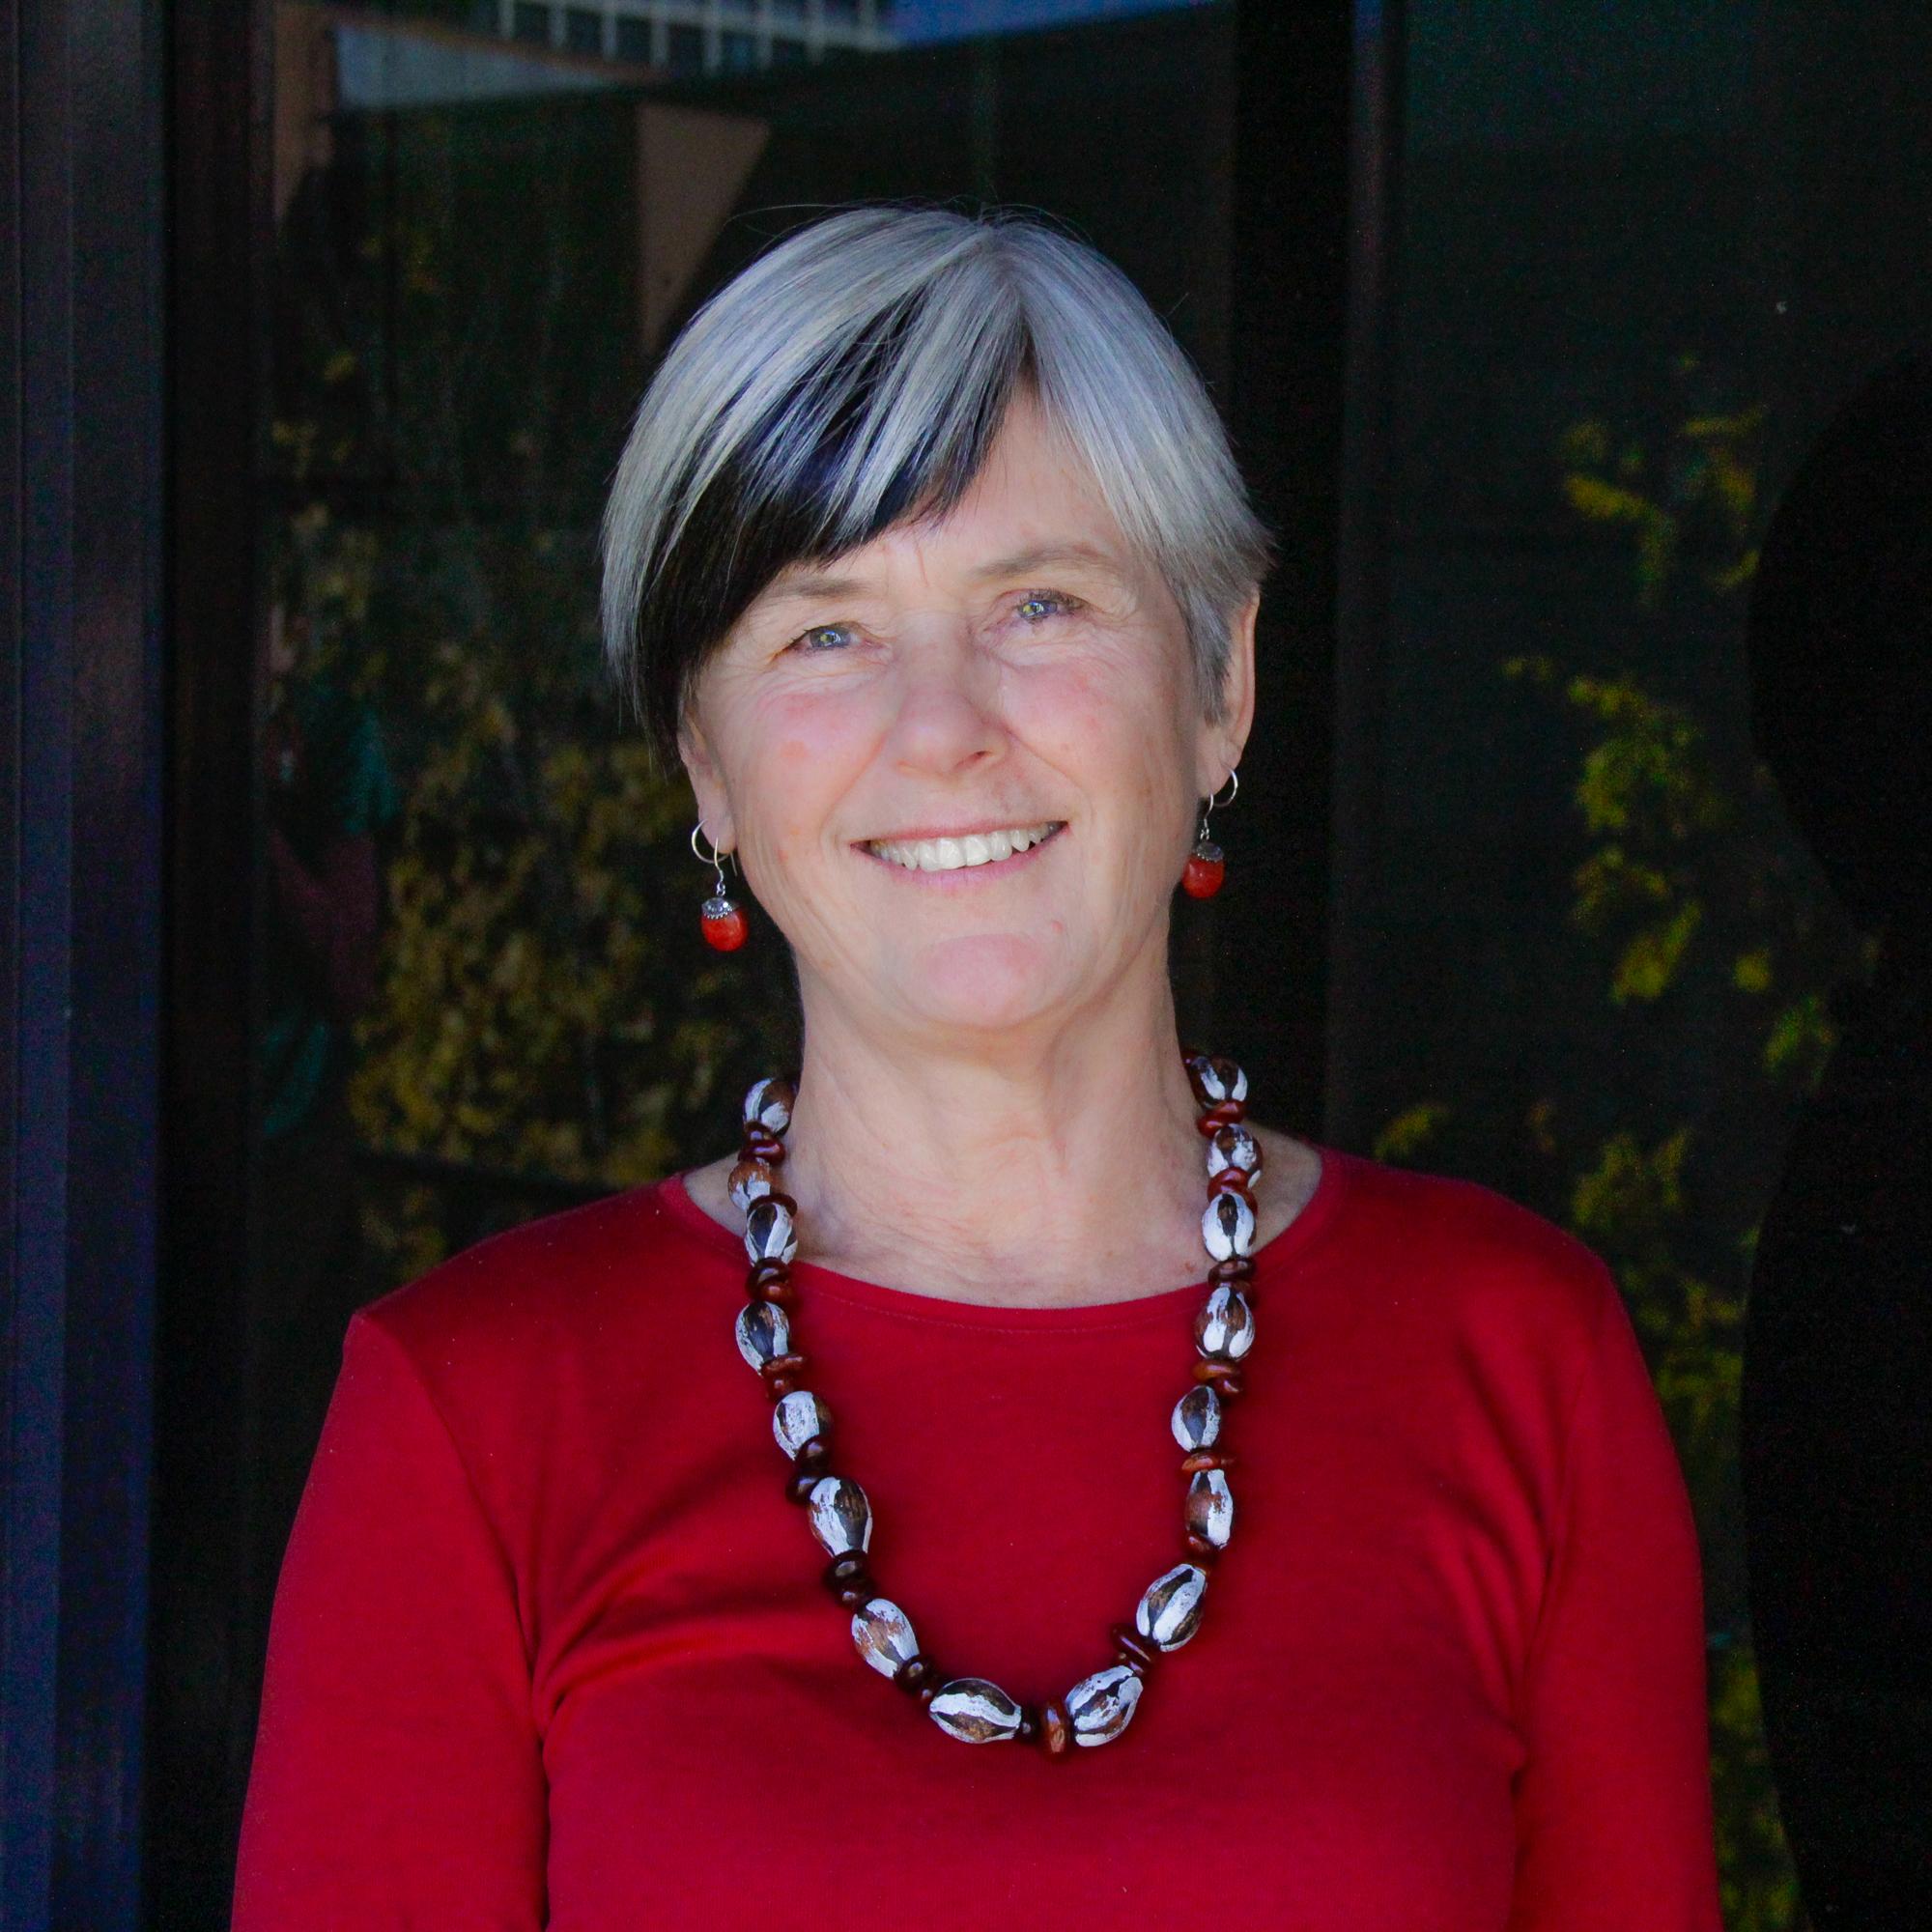 Lyn Bevington